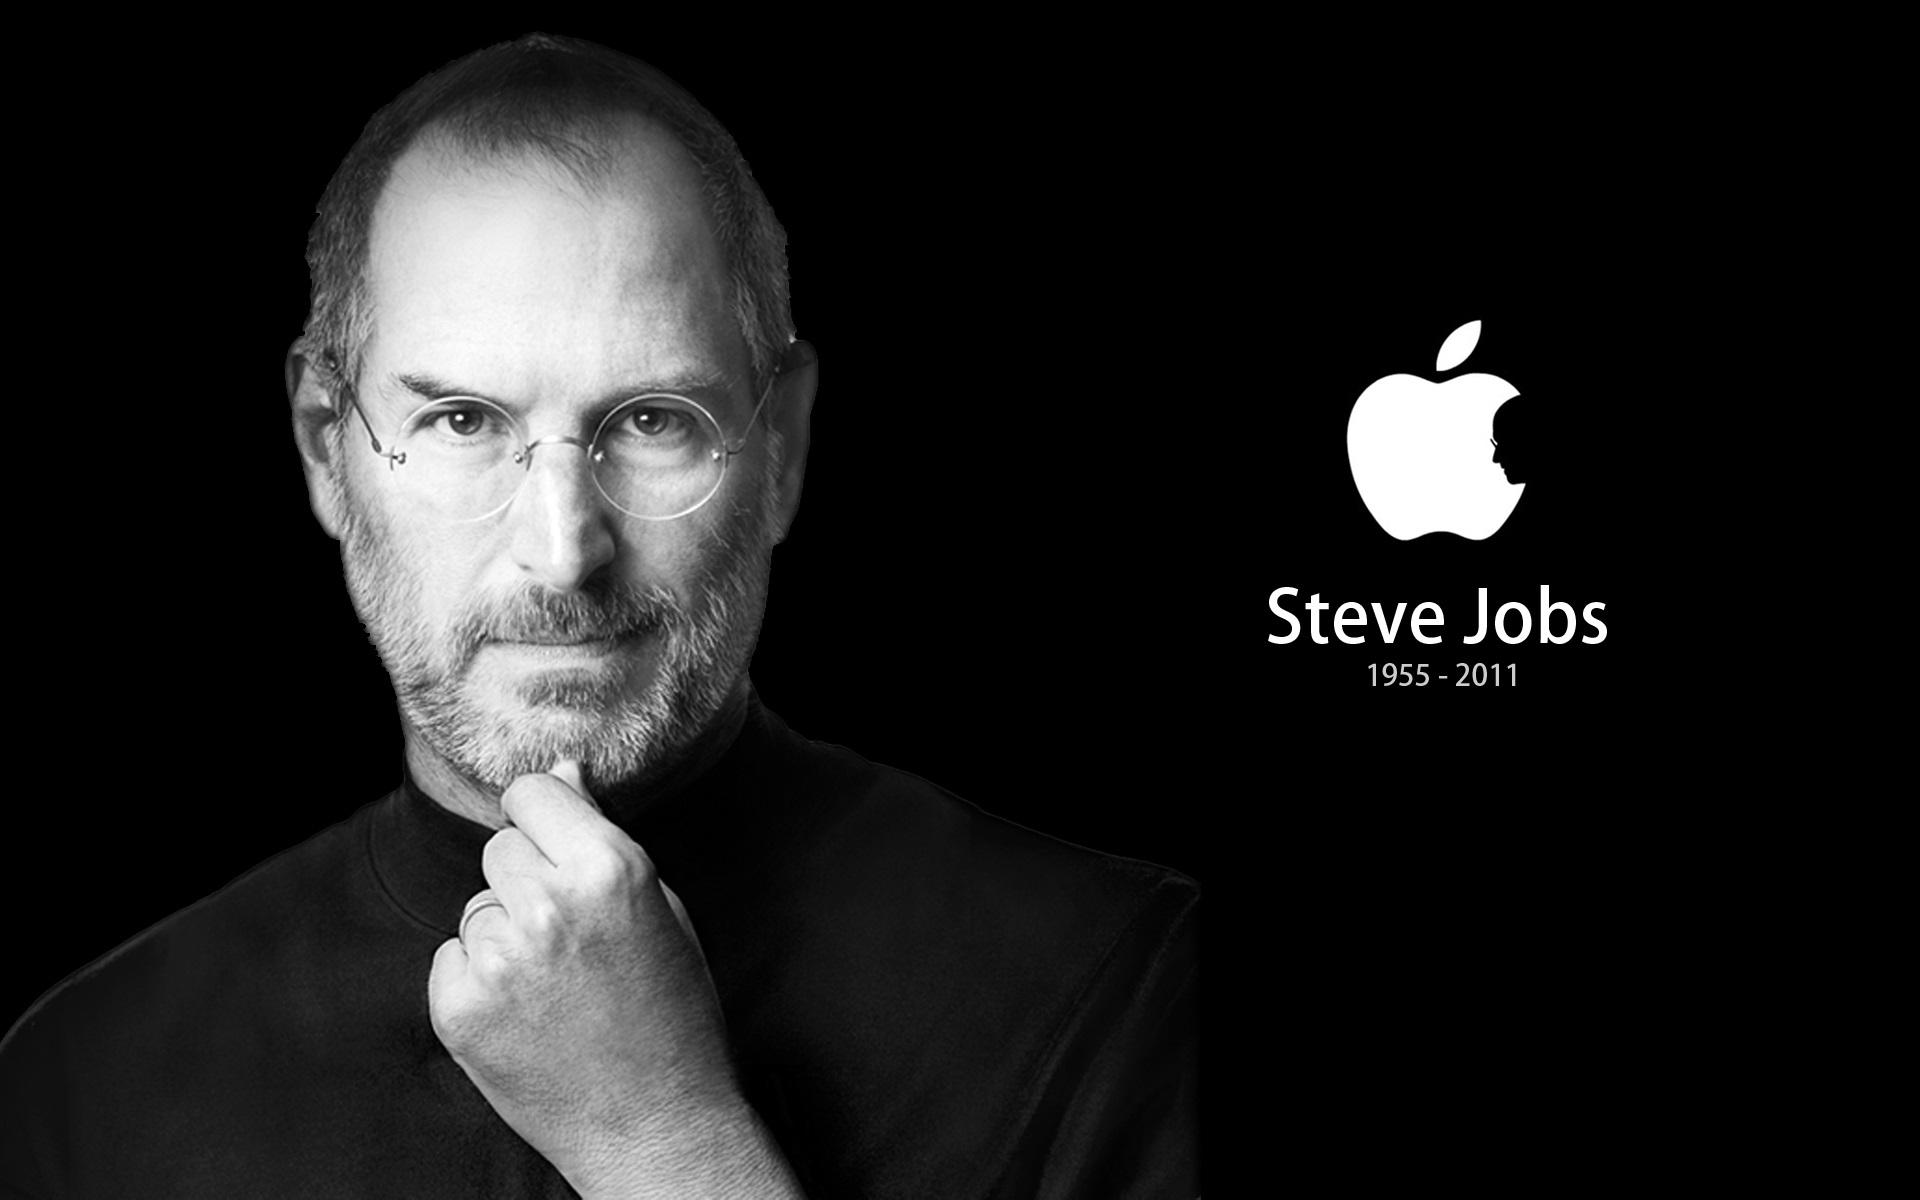 netcom-group-apple-steve-jobs-hommage